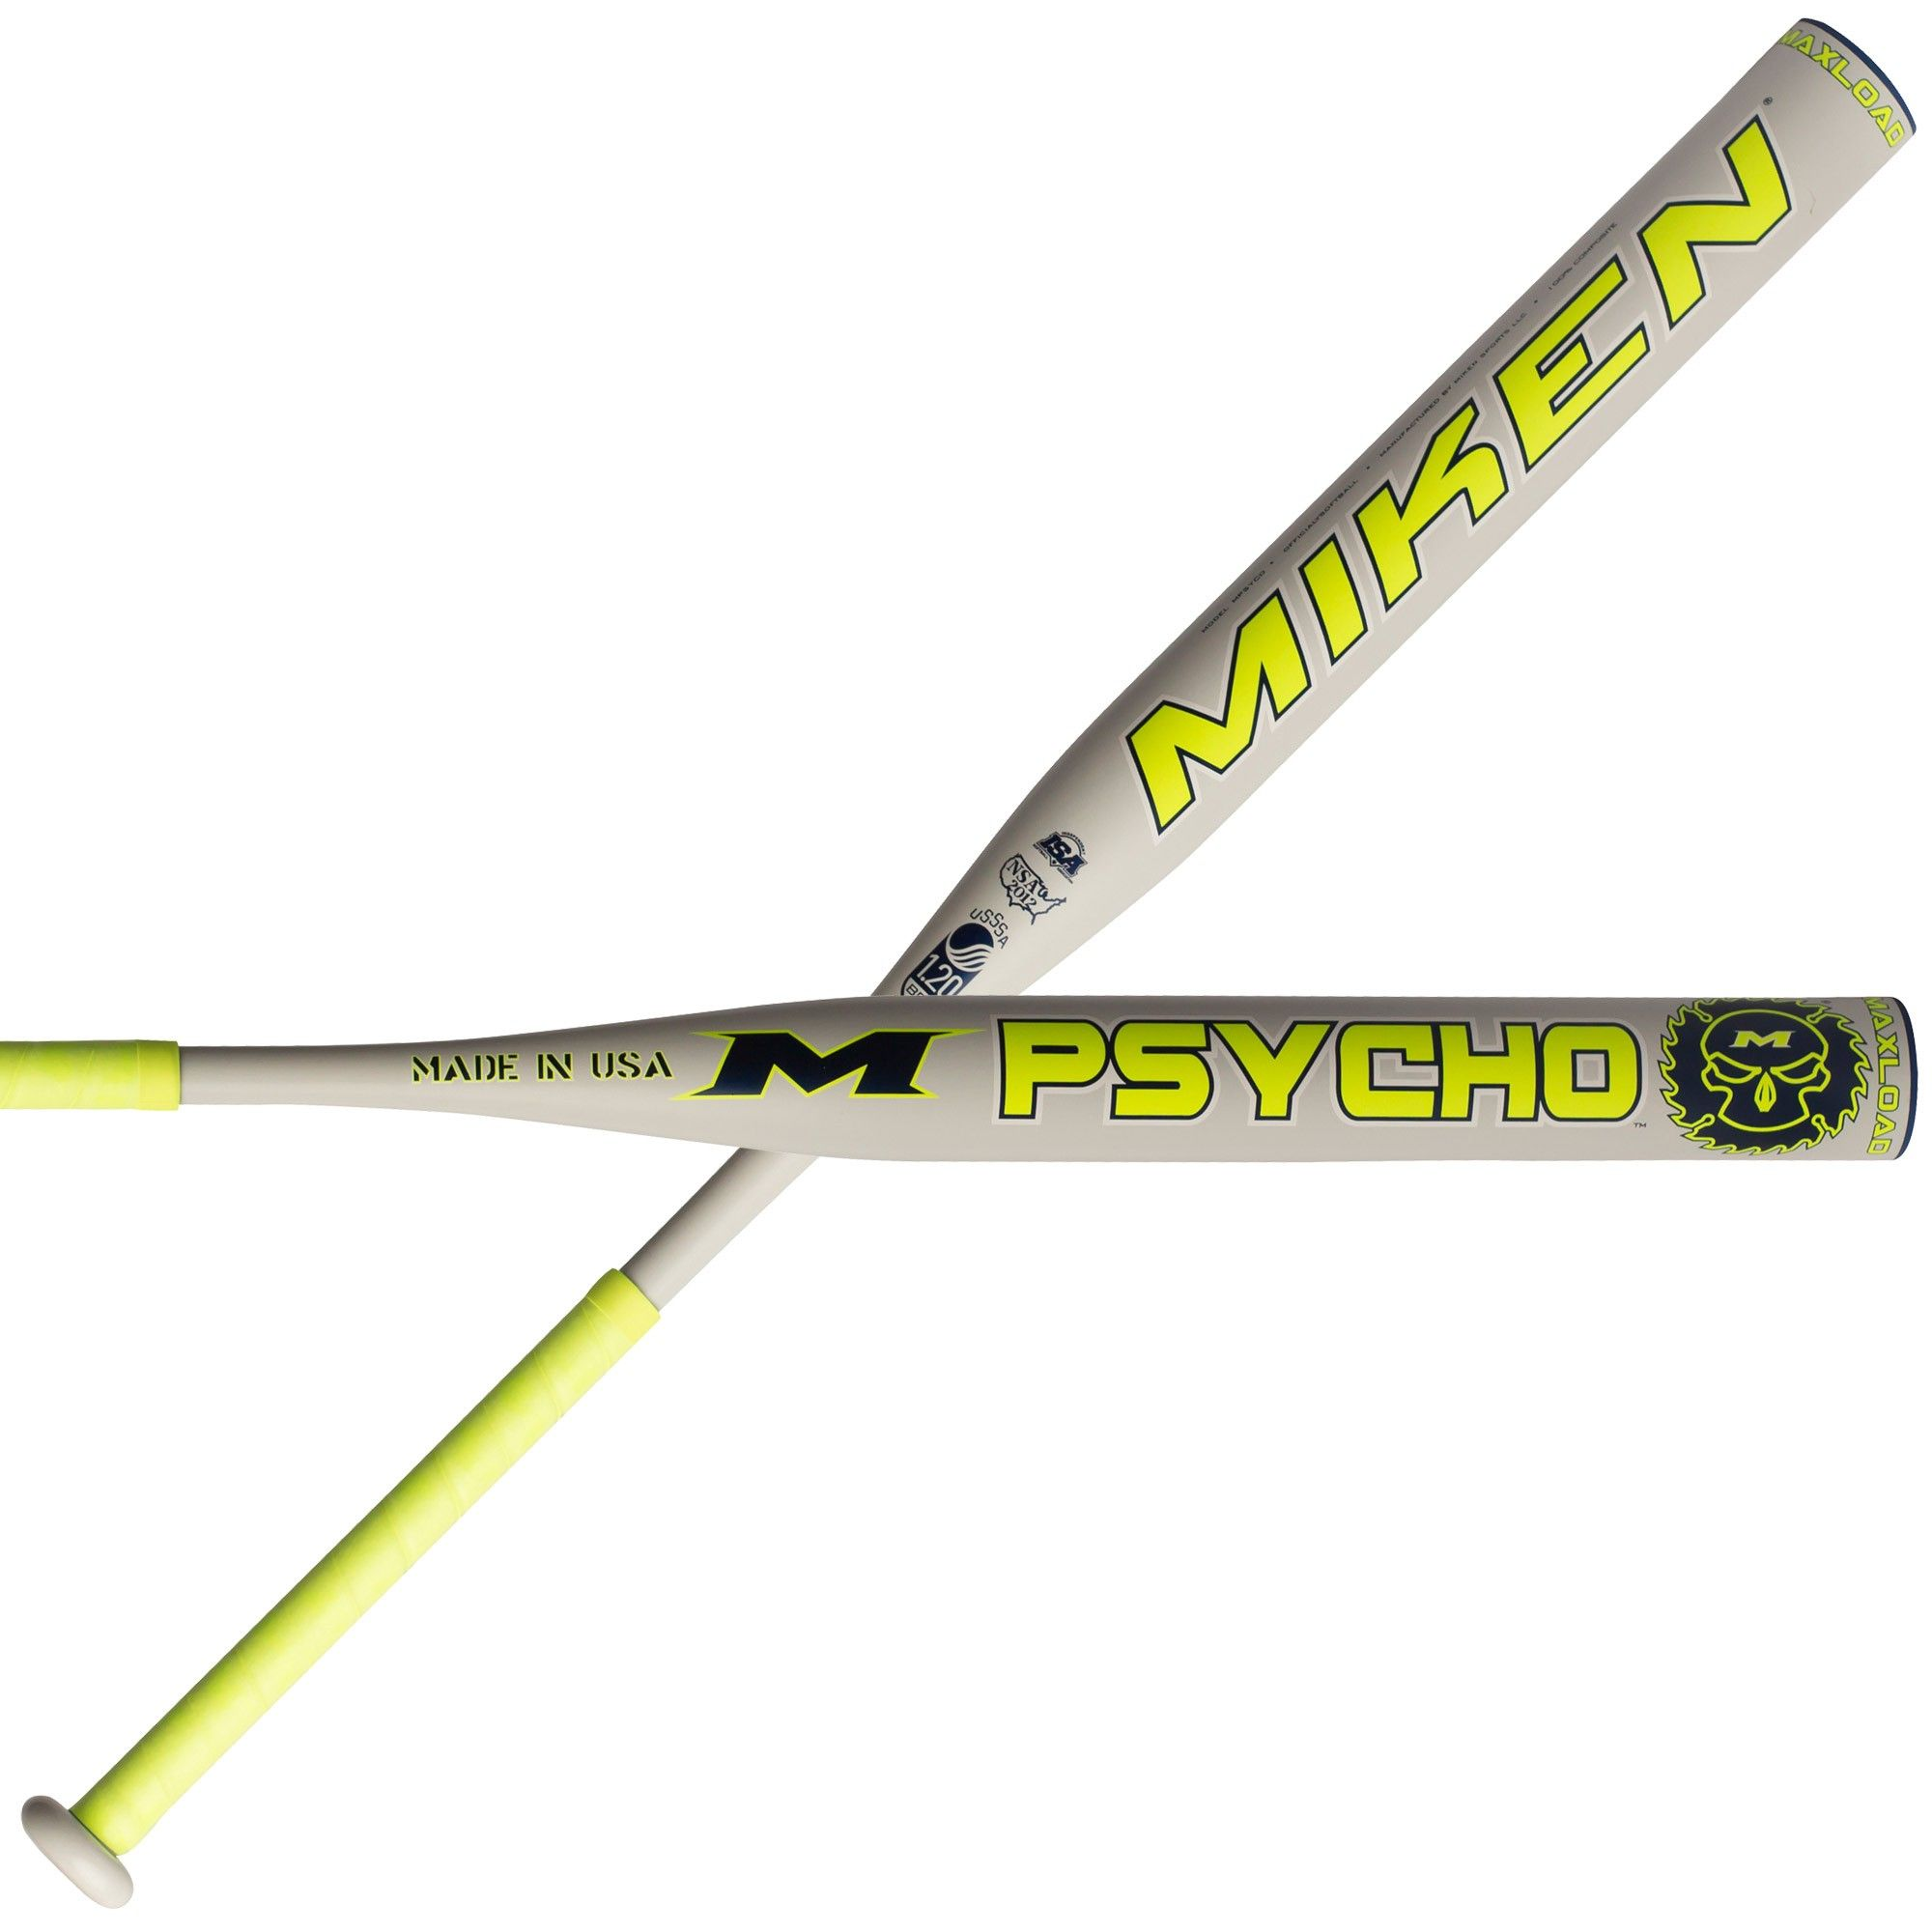 2019 Miken Psycho Maxload 34//25 MPSYCO Softball Bat USSSA